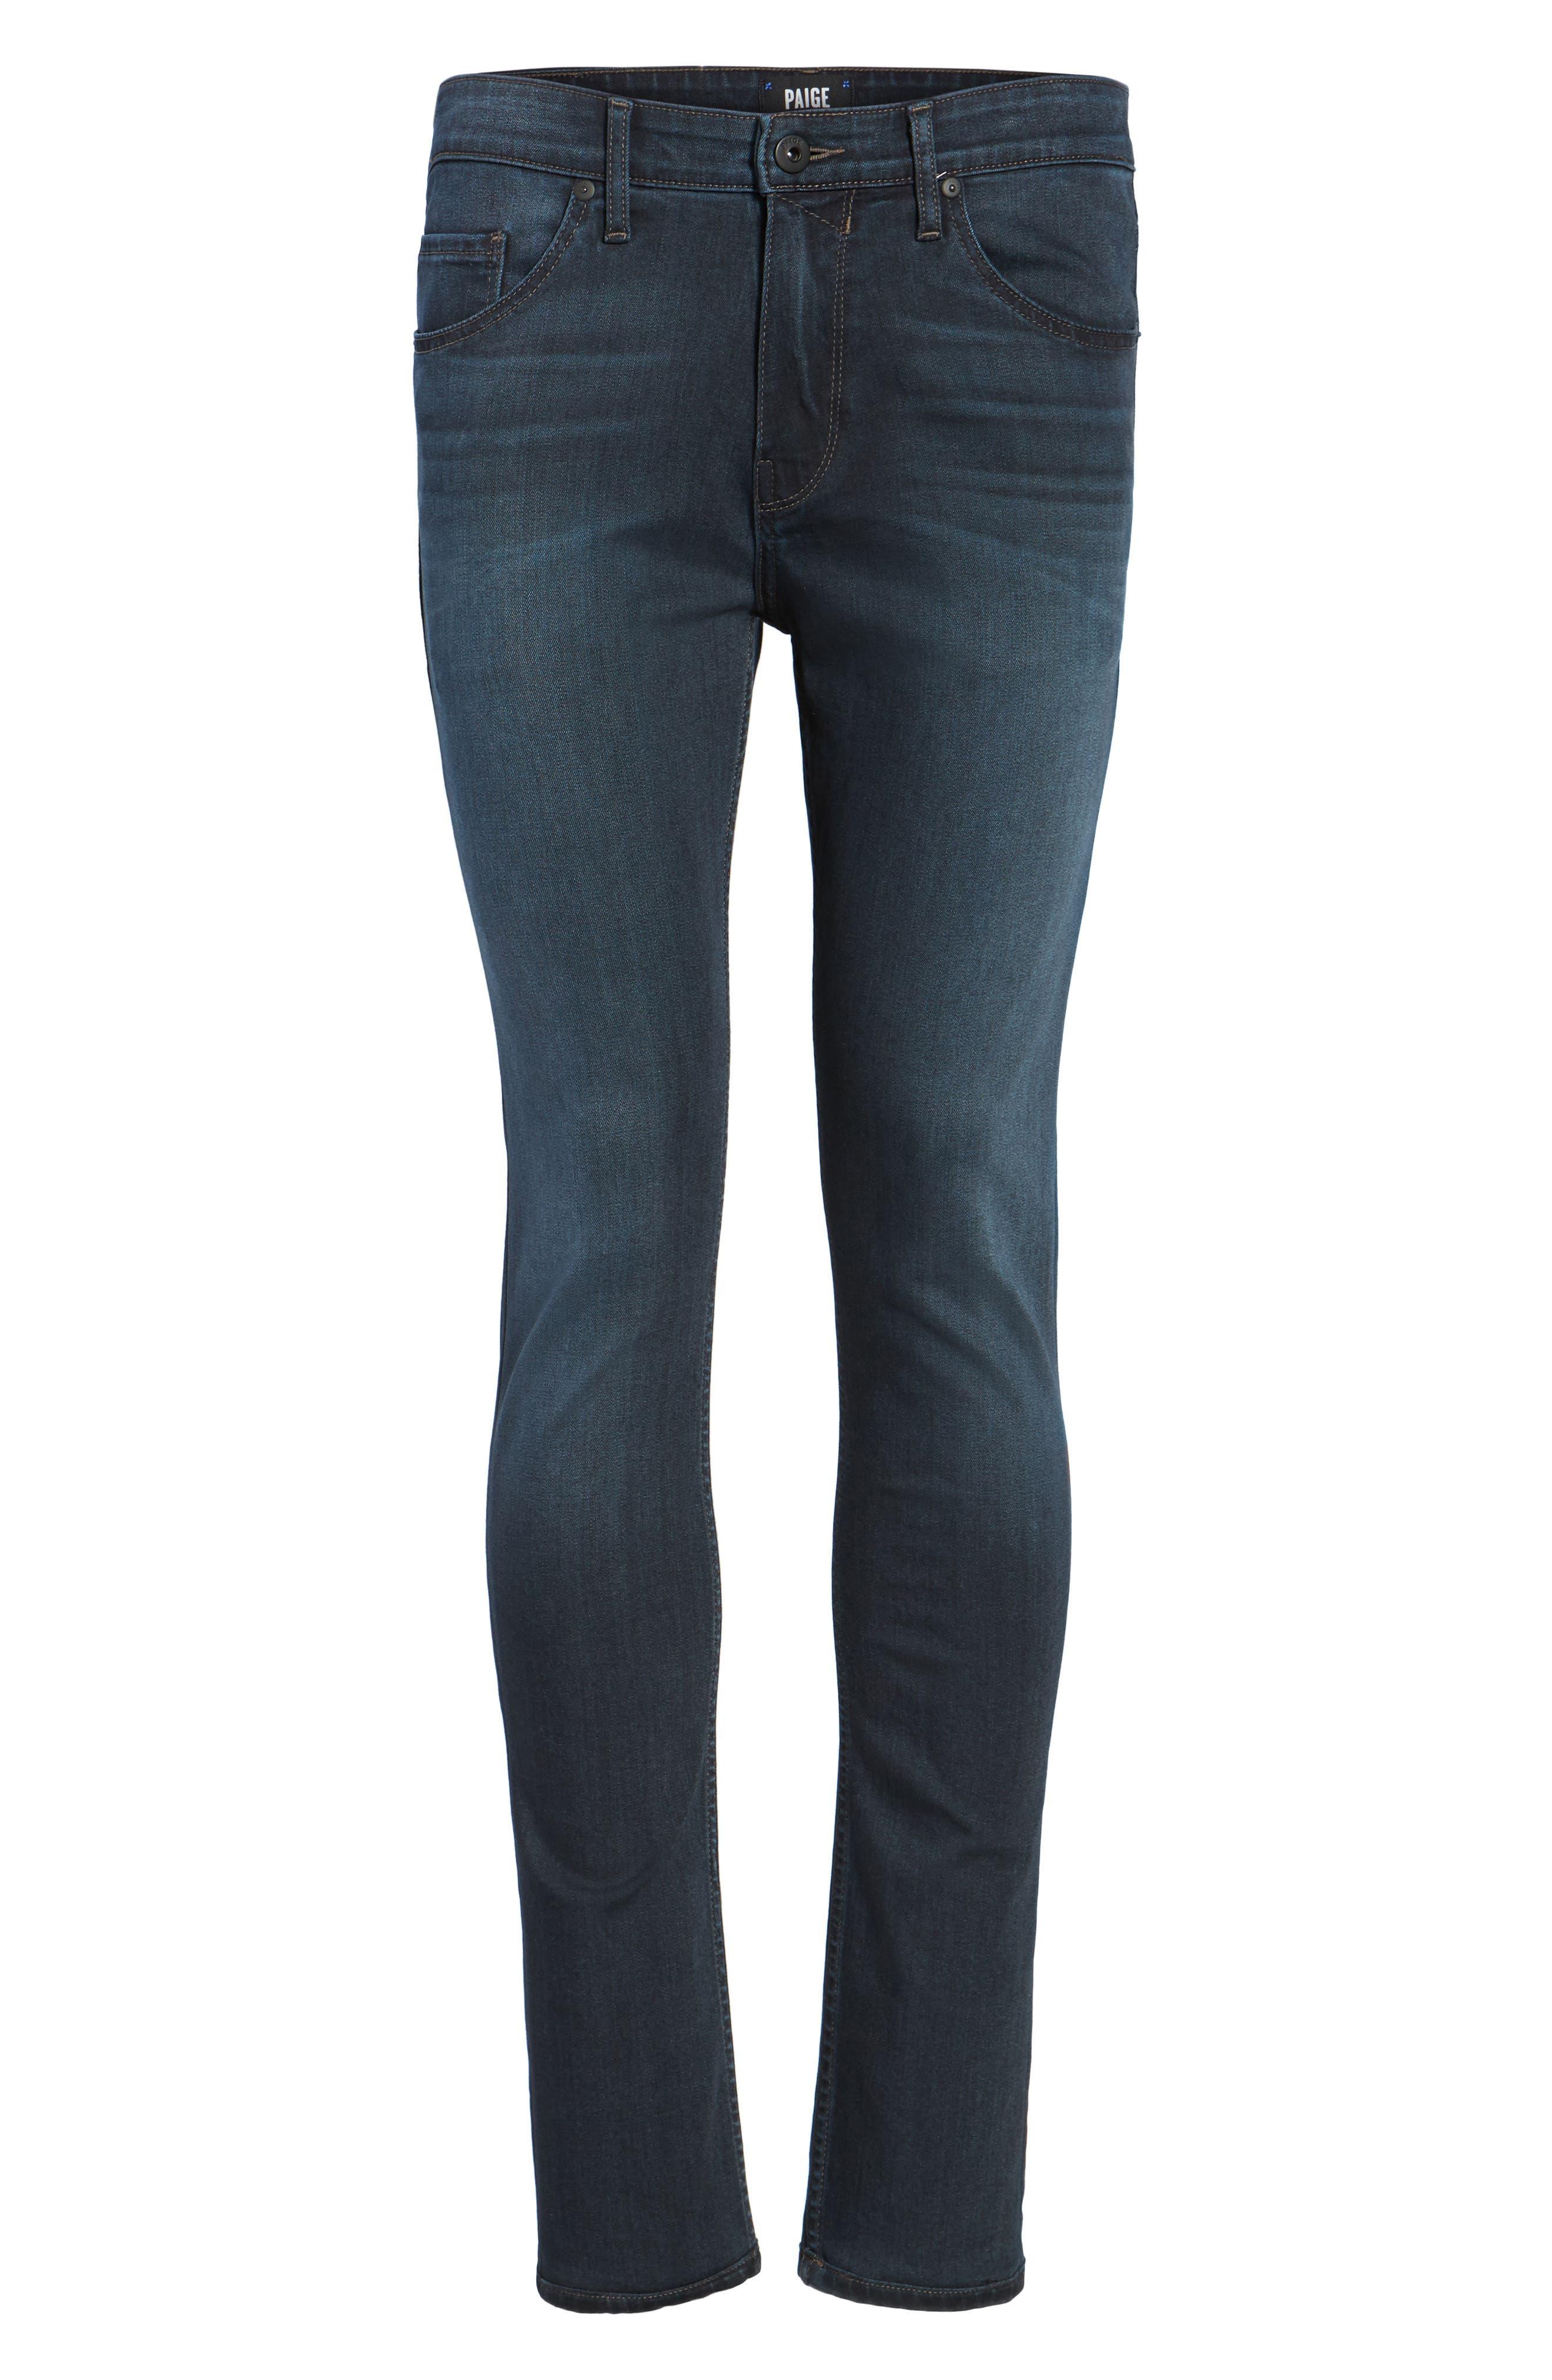 Croft Skinny Fit Jeans,                             Alternate thumbnail 6, color,                             400